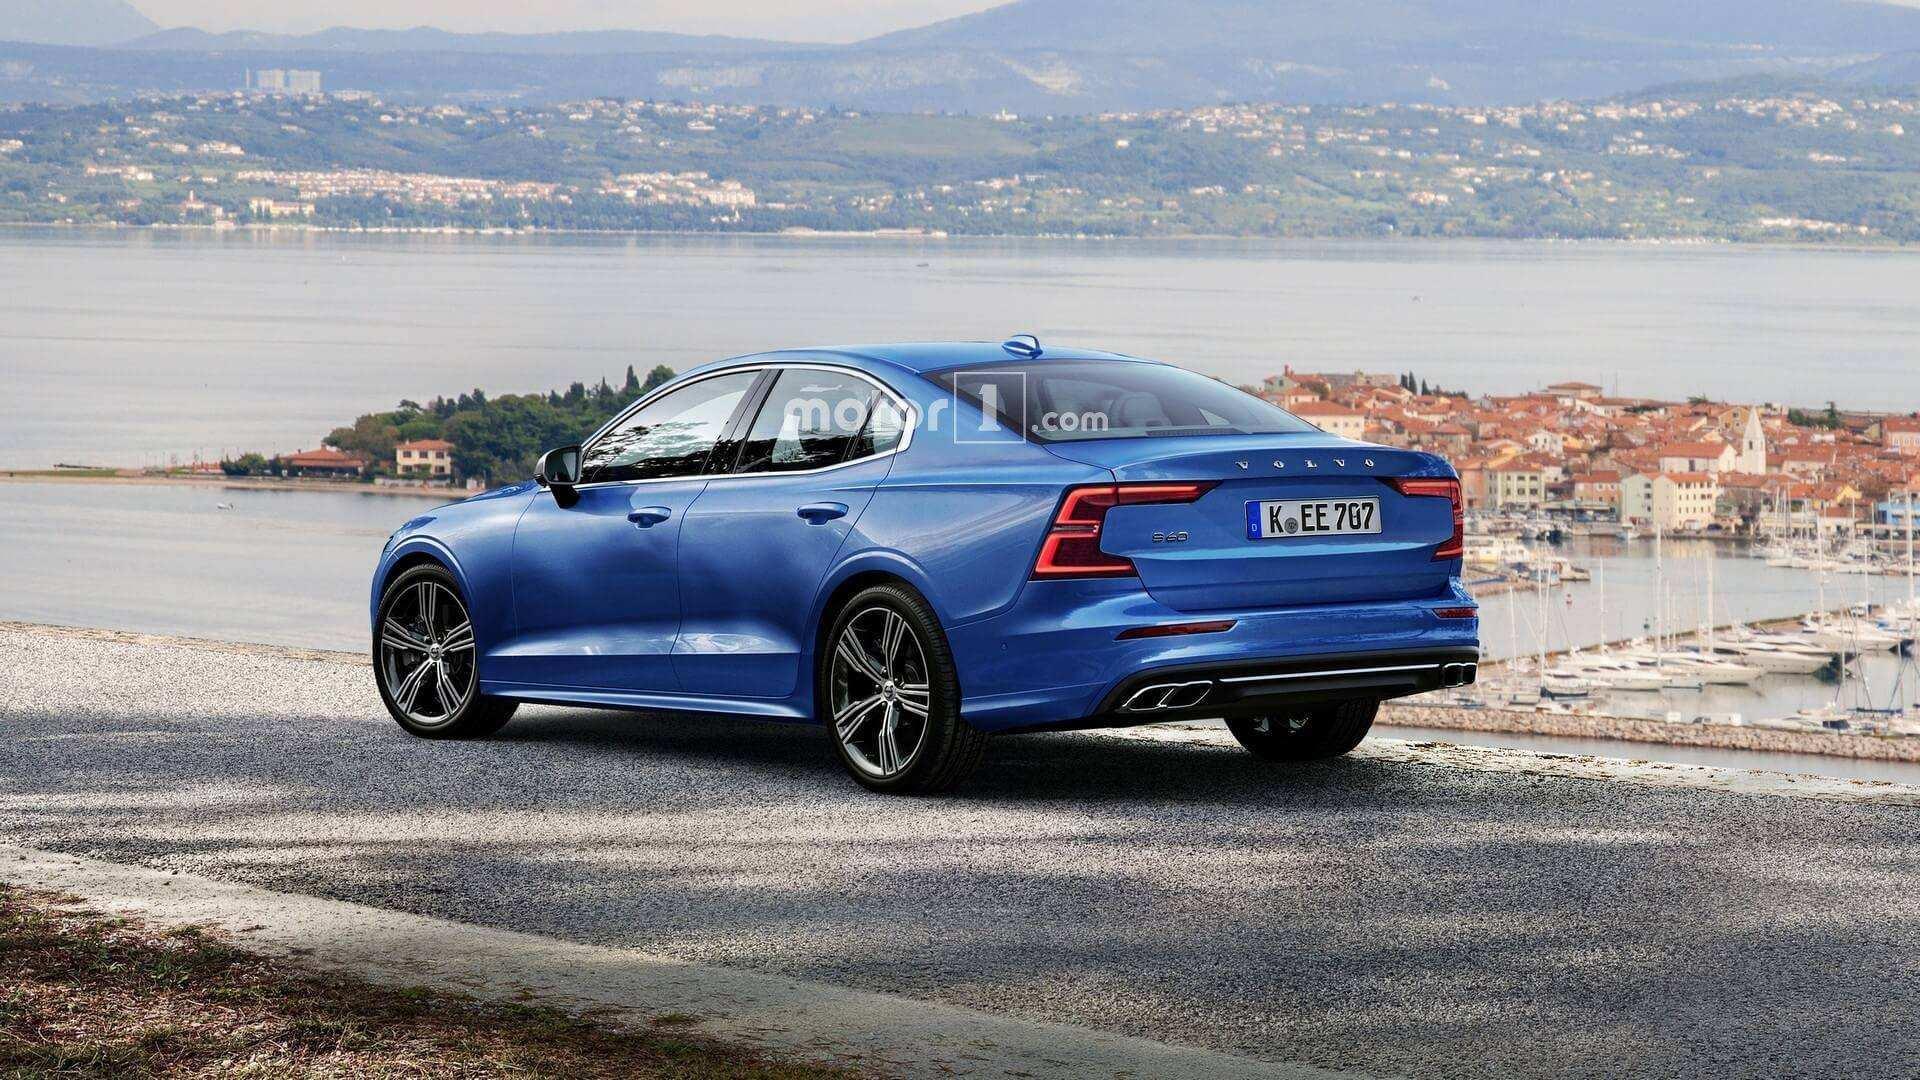 27 Best Review 2019 Volvo Sedan Concept with 2019 Volvo Sedan